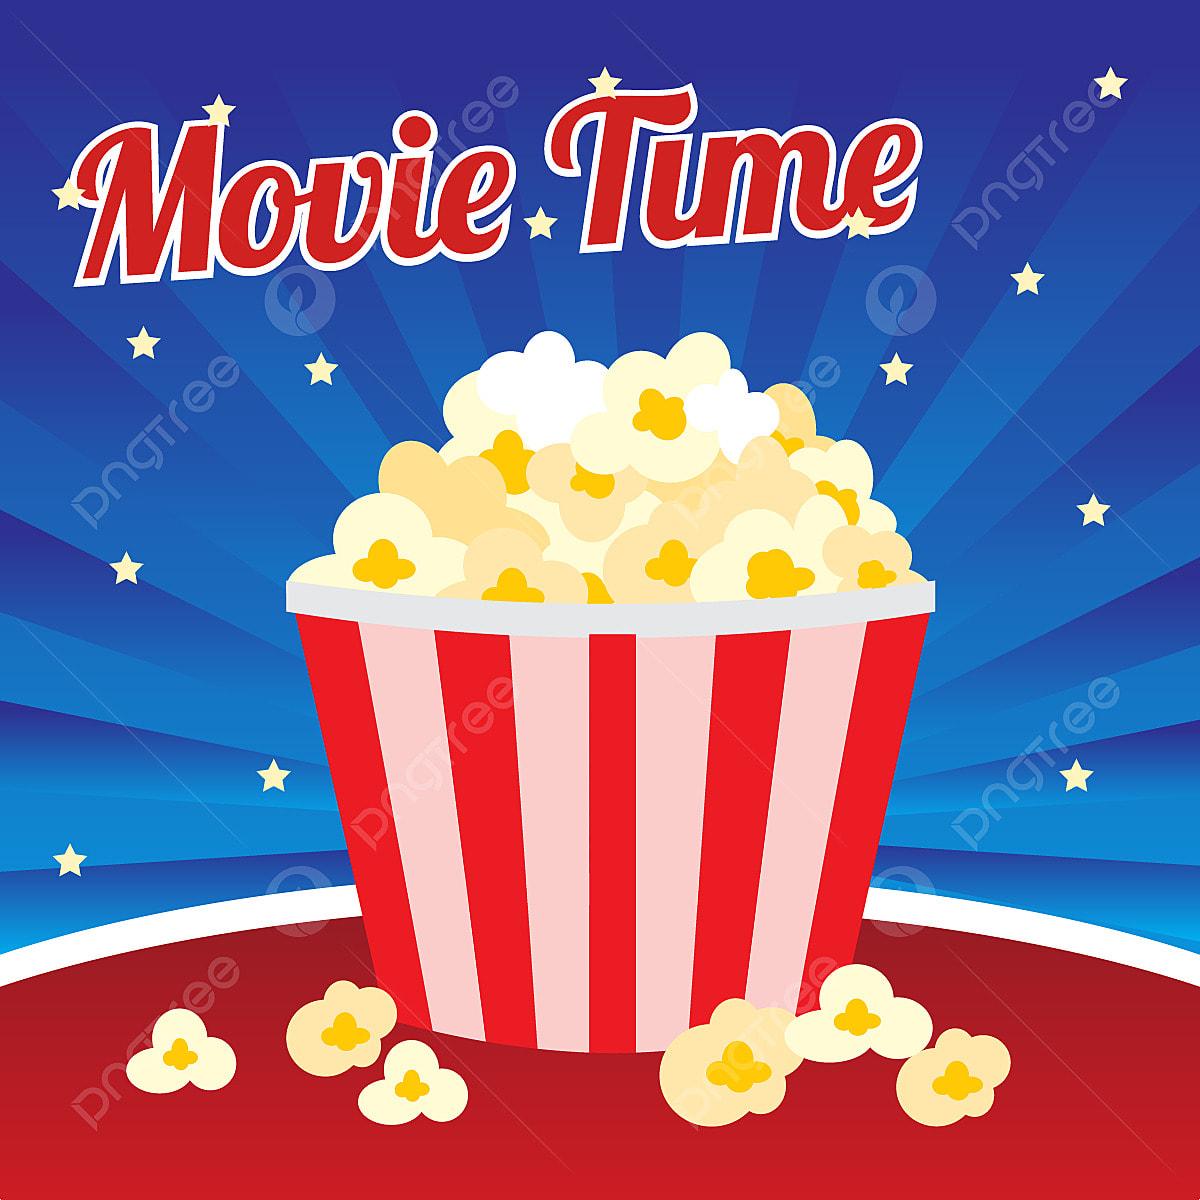 Movie Time Clip Art at Clker.com - vector clip art online